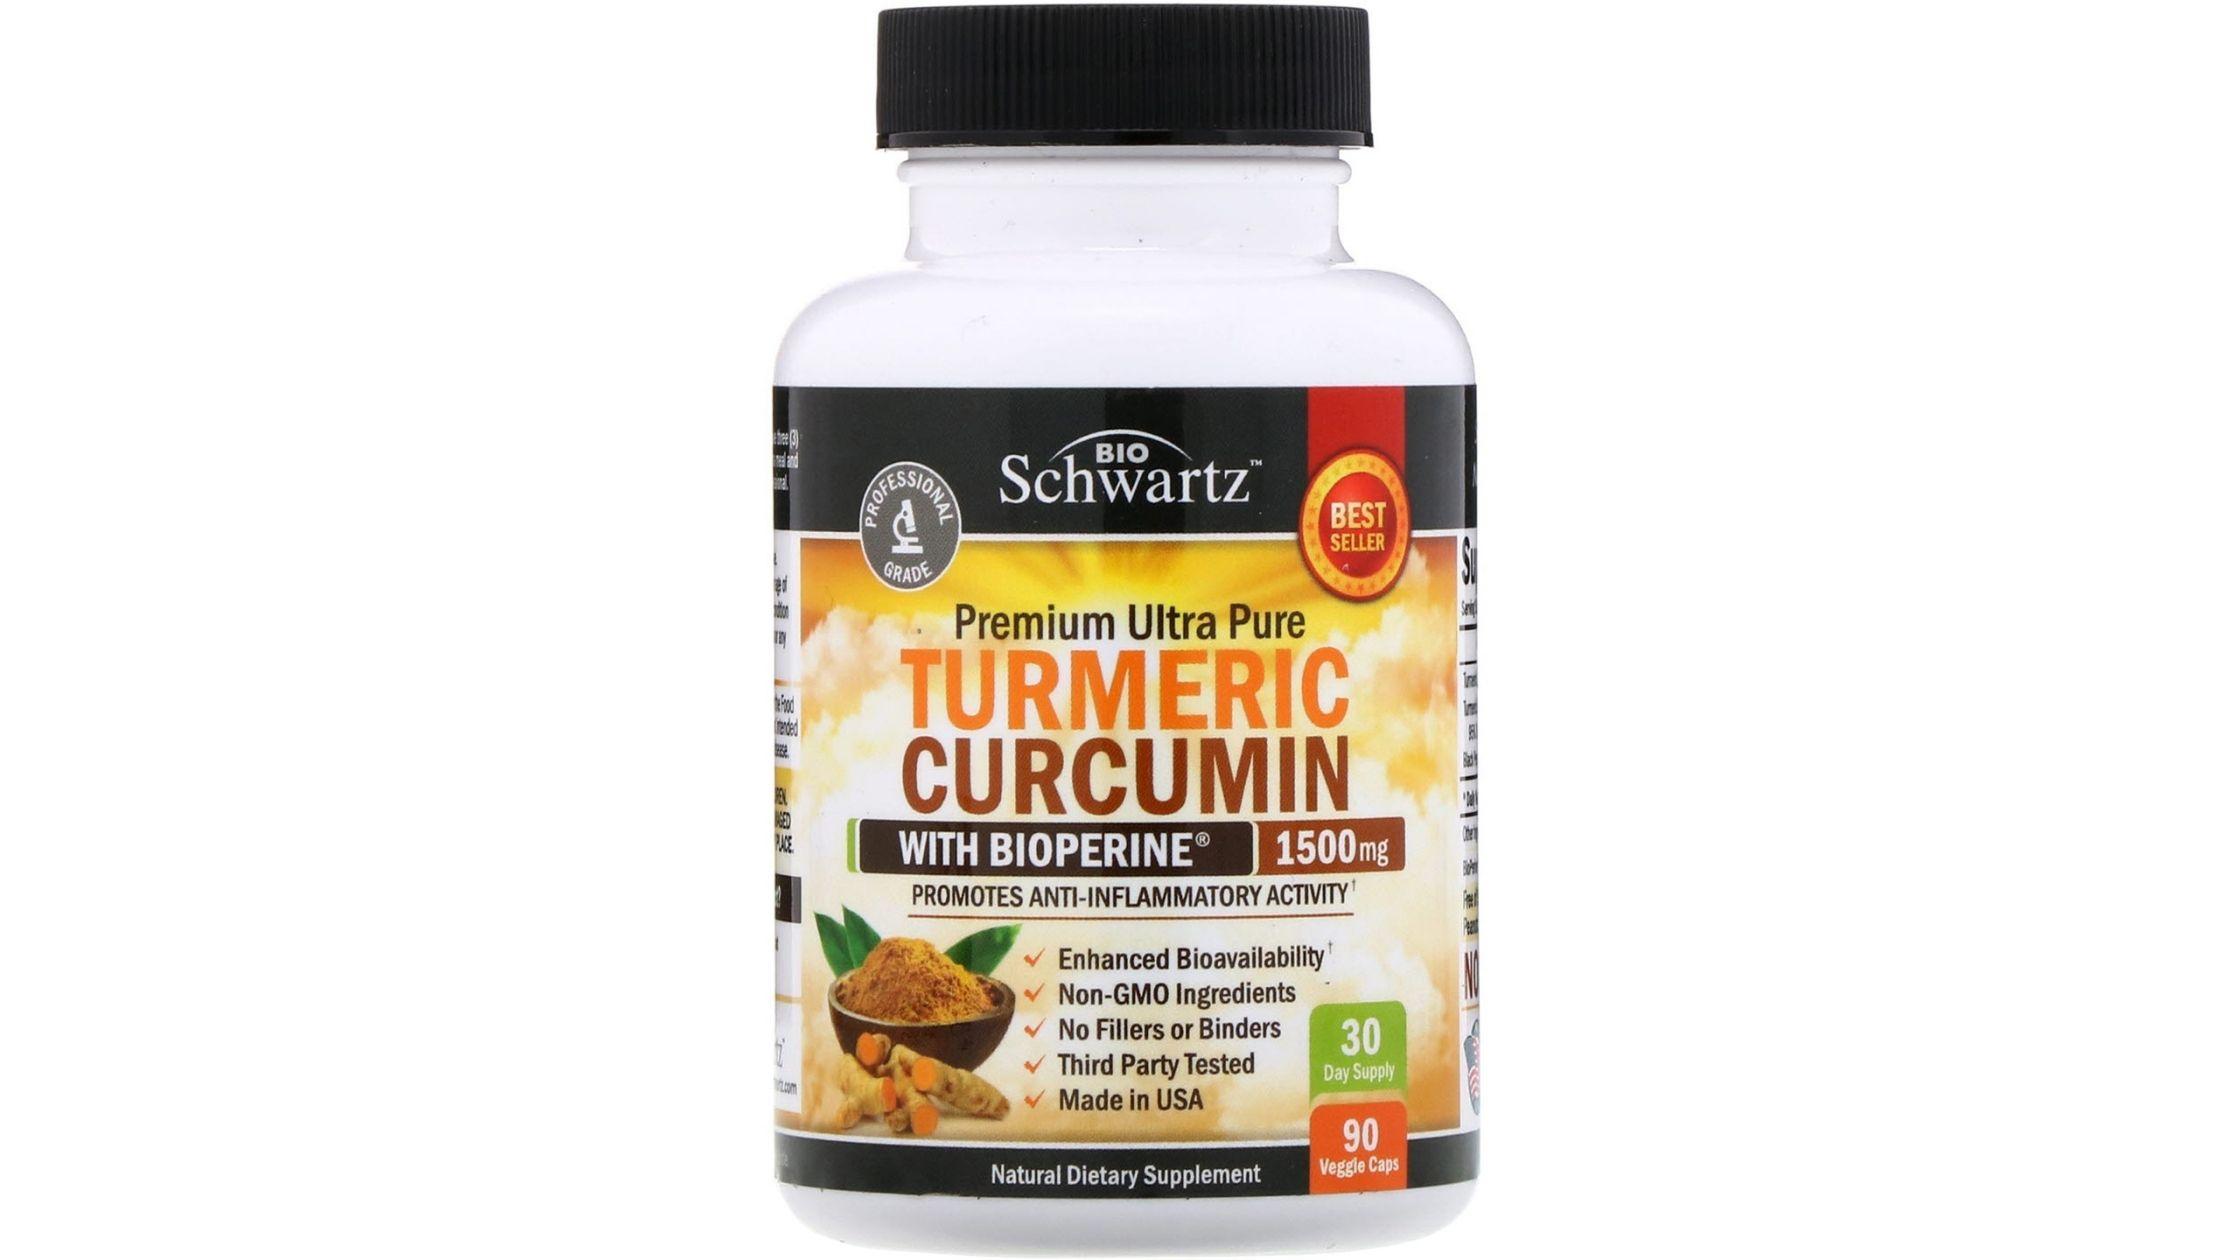 BioSchwartz turmeric curcumin with Bioperine